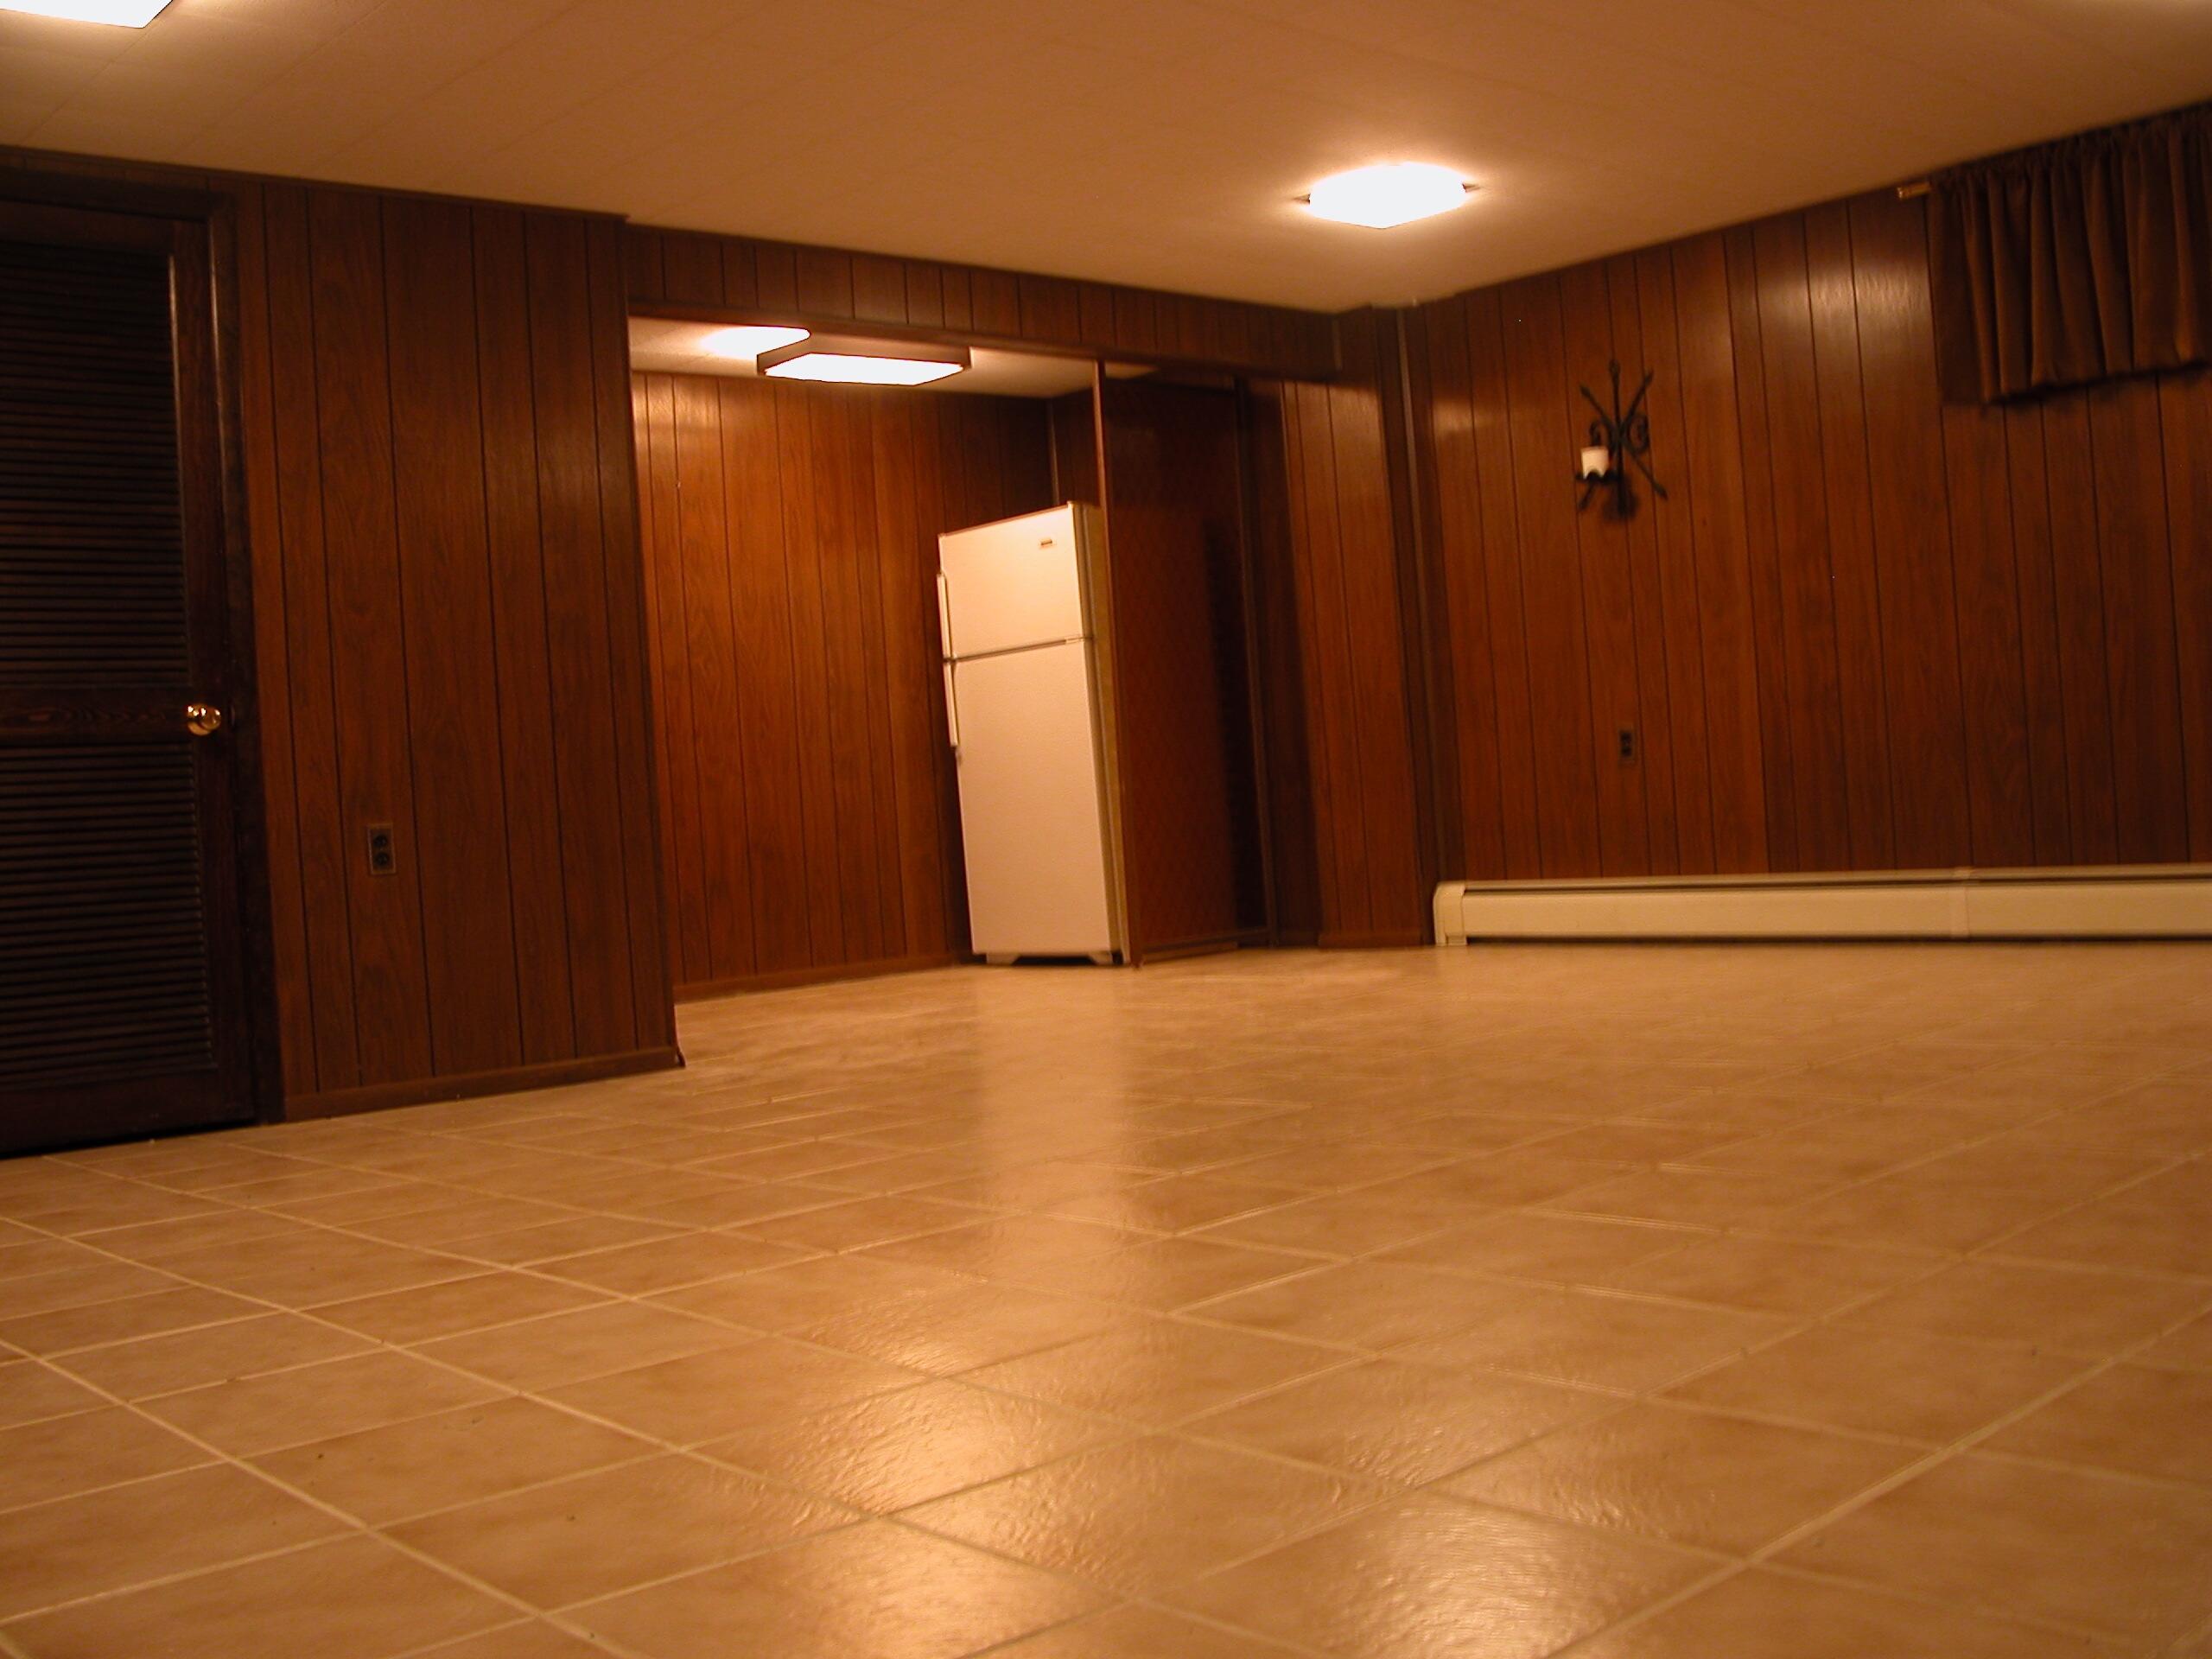 Best Flooring Options For Finished Basement